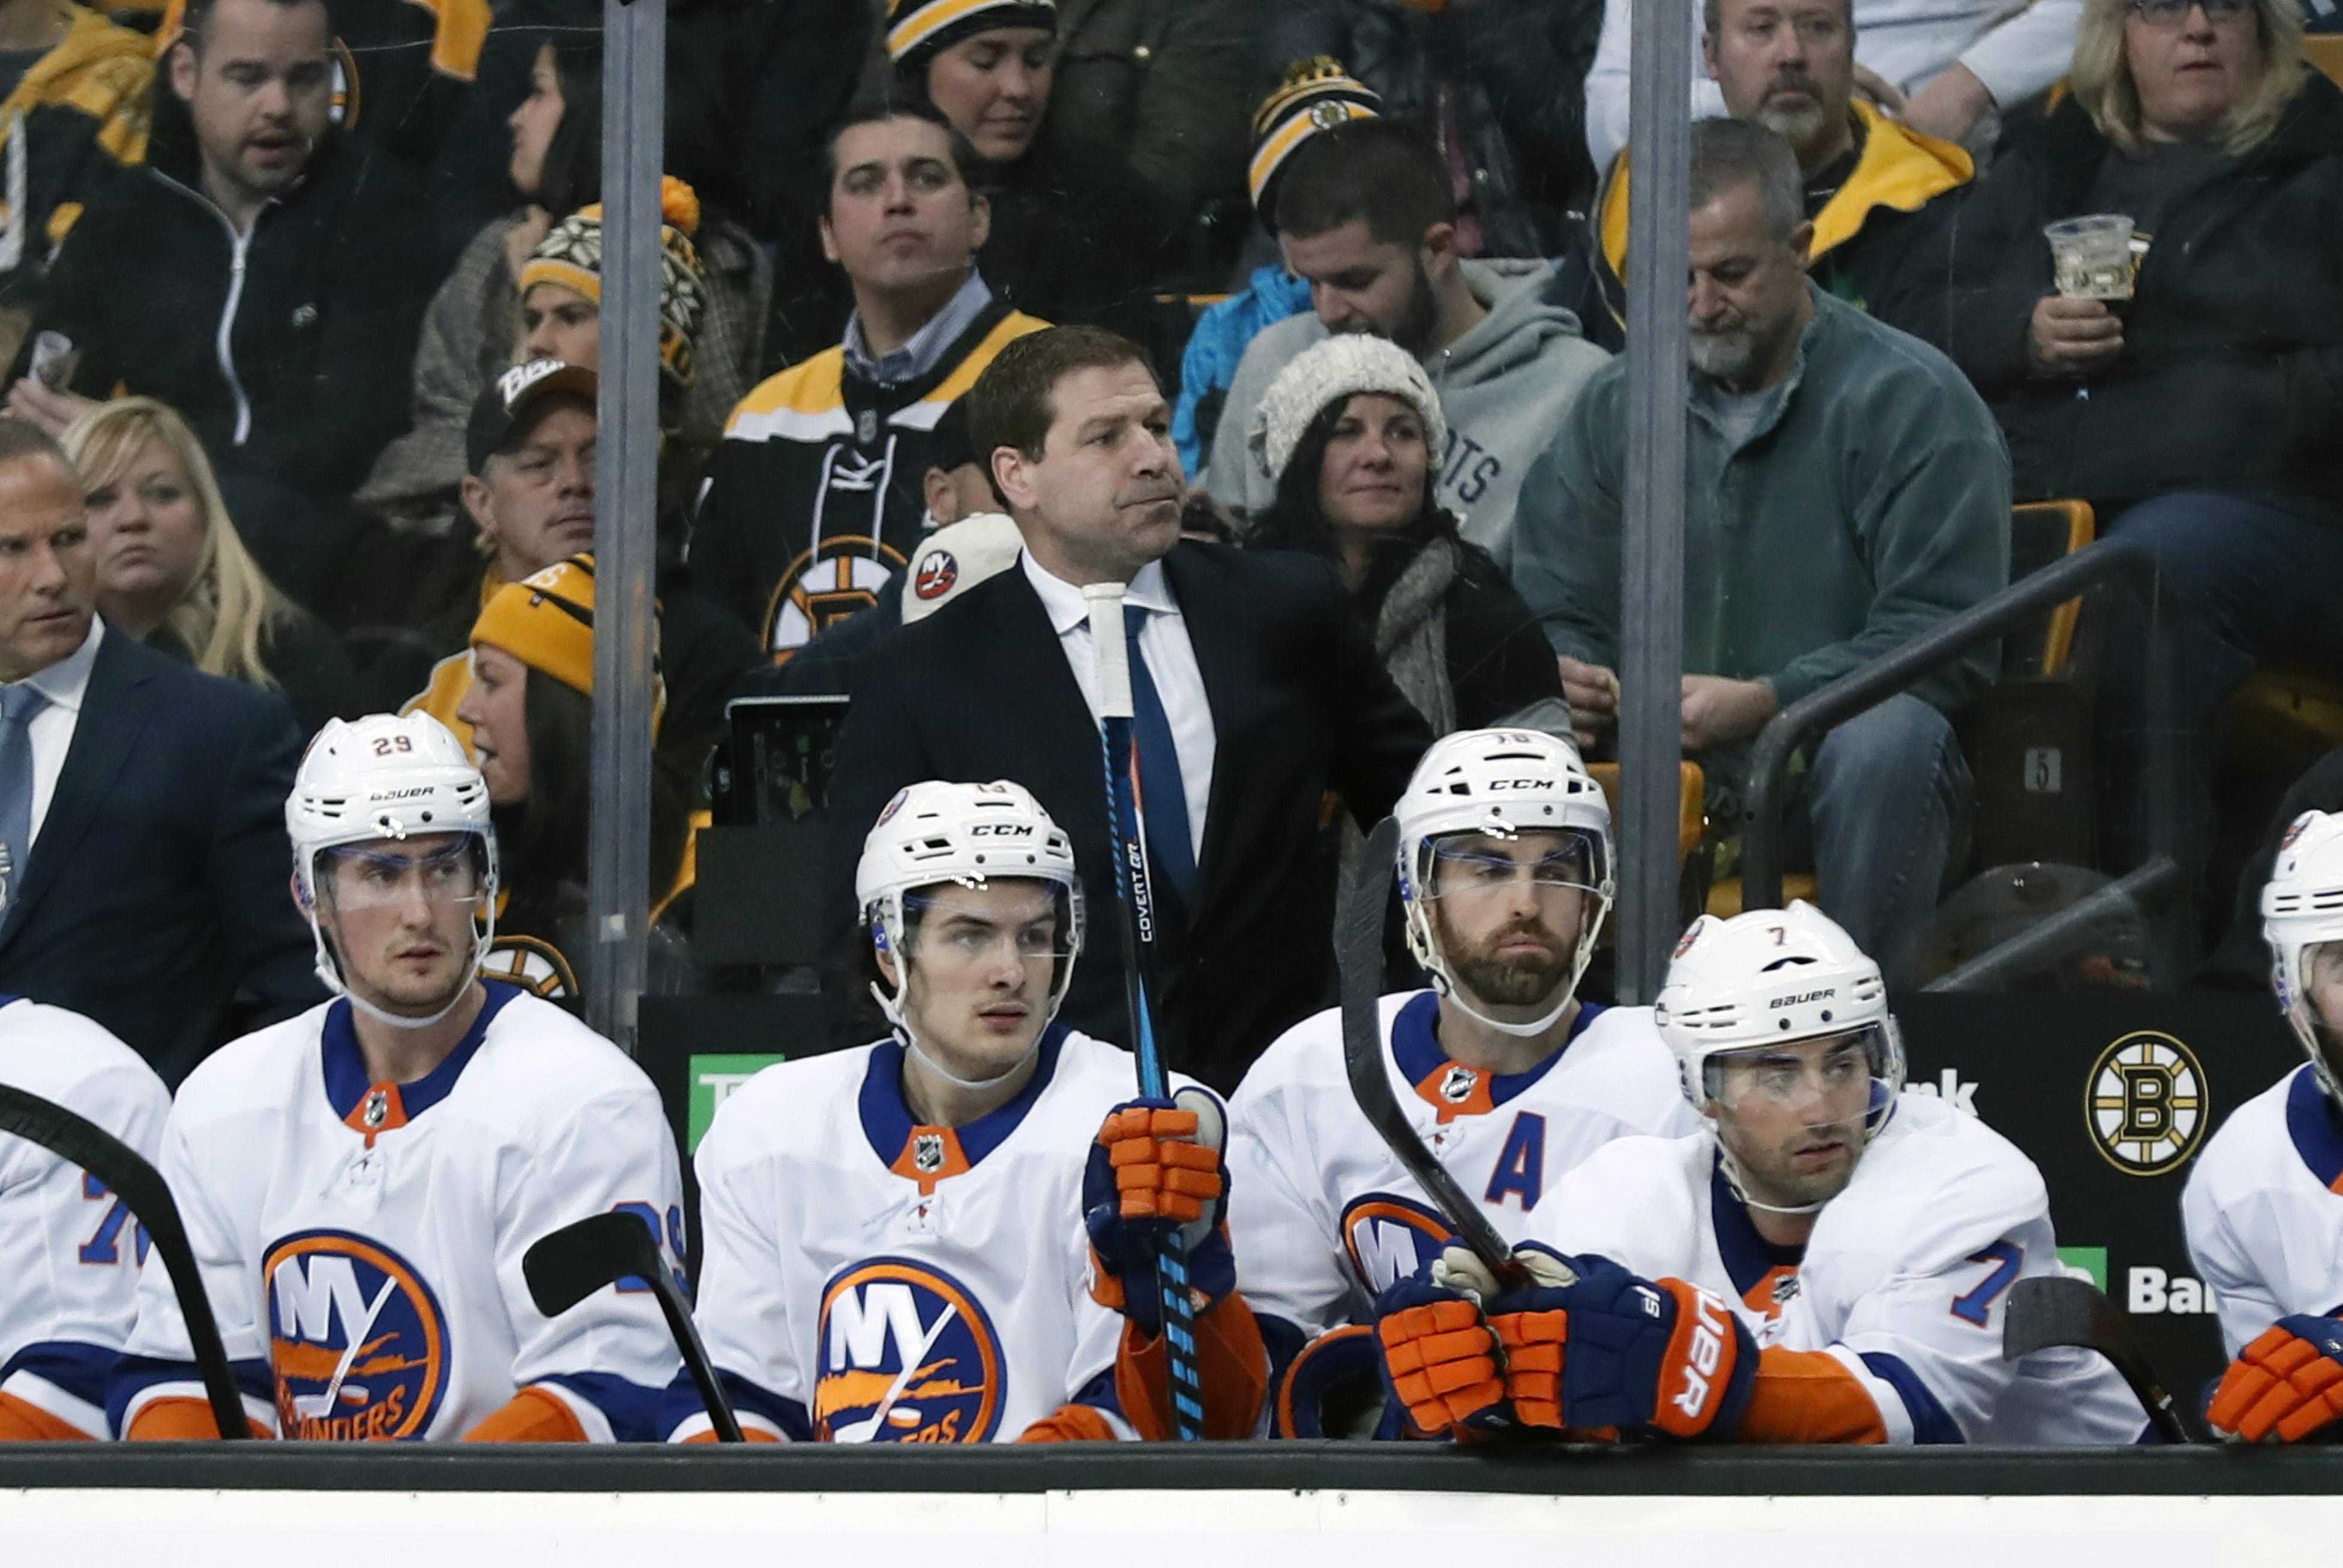 NHL: DEC 09 Islanders at Bruins